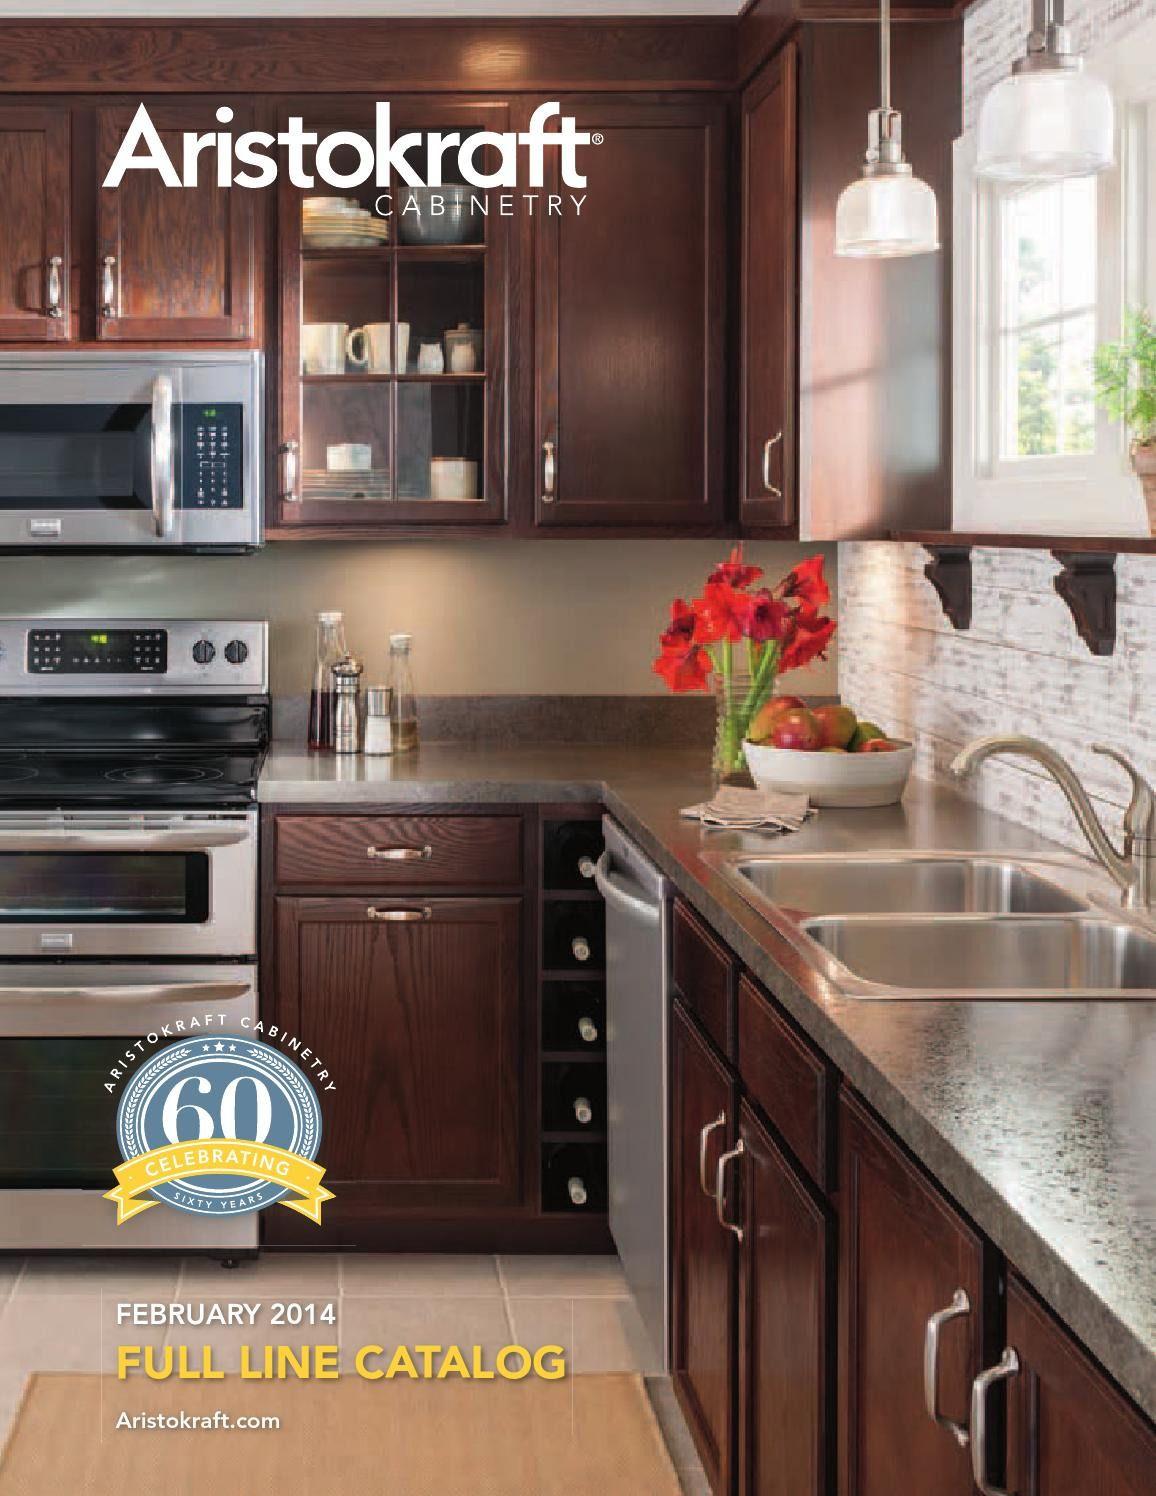 Aristokraft Cabinet Doors 2021 In 2020 Aristokraft Cabinets Kitchen Cabinets Prices Kitchen Cabinets